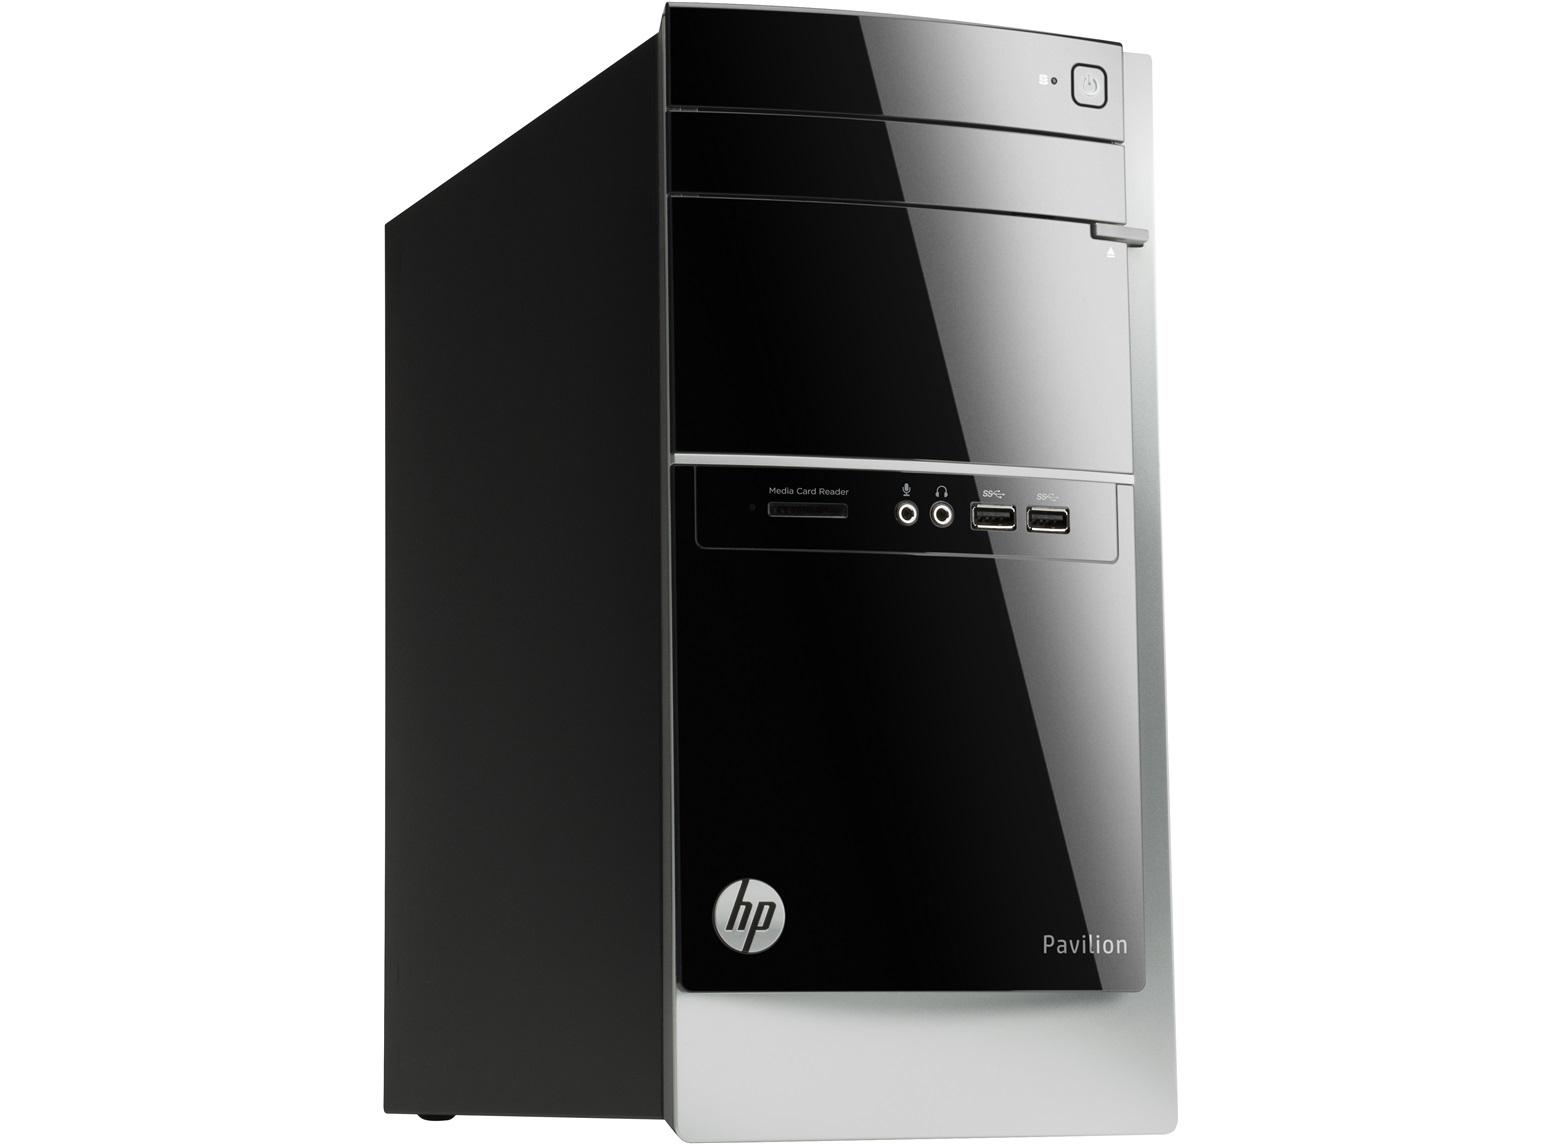 Máy bộ HP Pavilion 500-513x, Core i3-4160/4GB/500GB (K5N74AA)